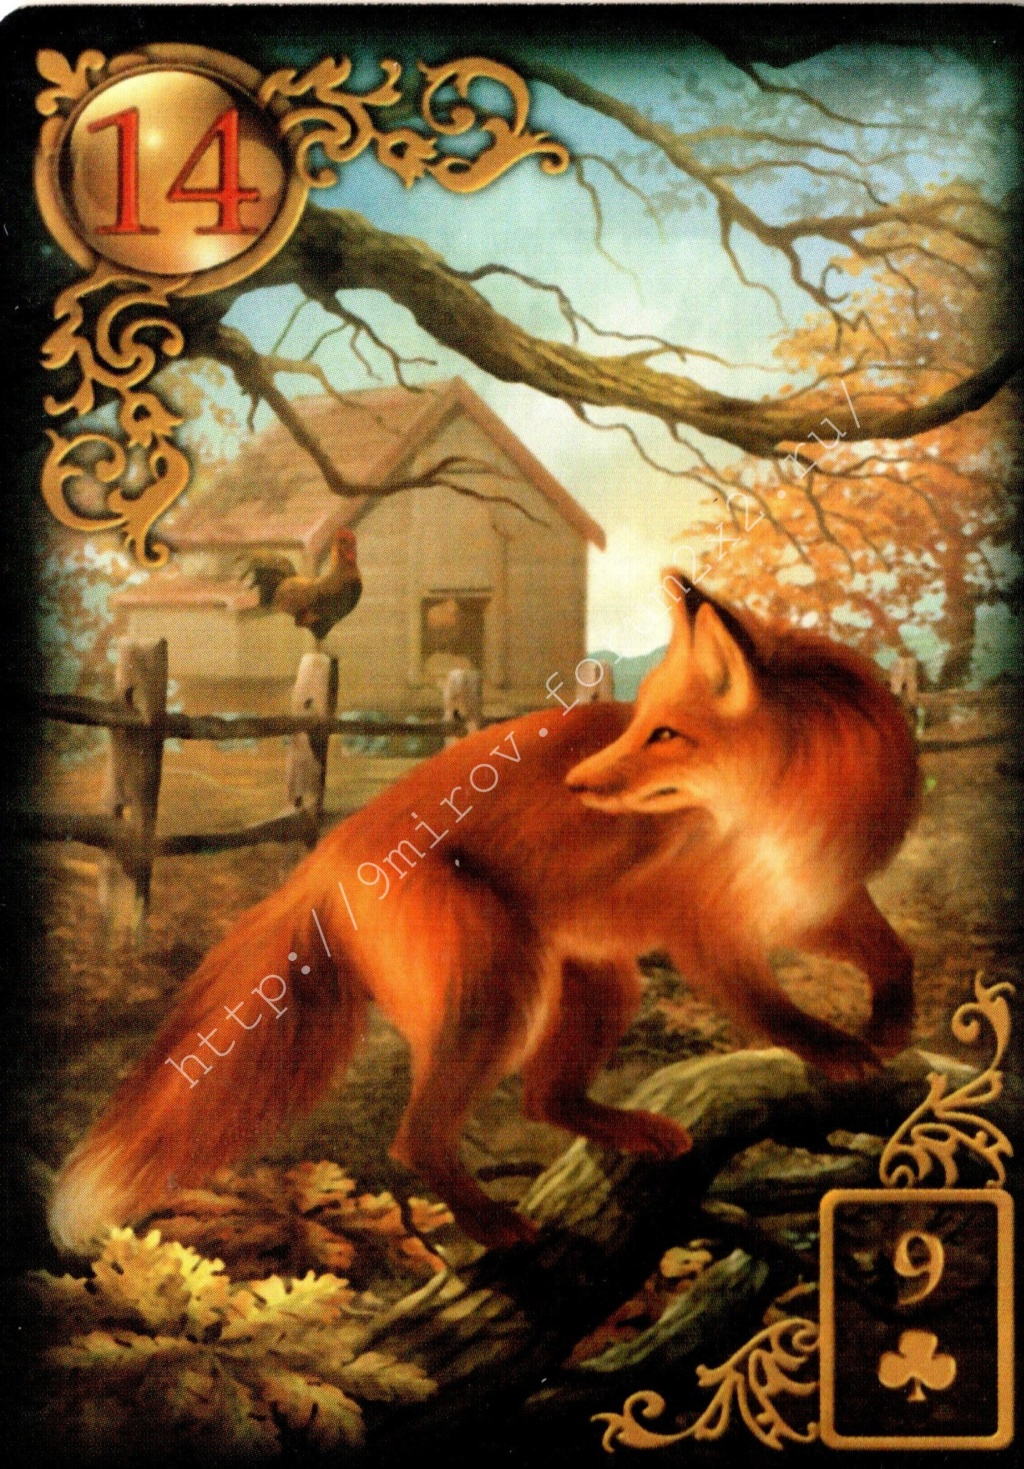 Золотые мечты Ленорман (Расширенное издание) | Gilded Reverie Lenormand. Галерея.  Water109